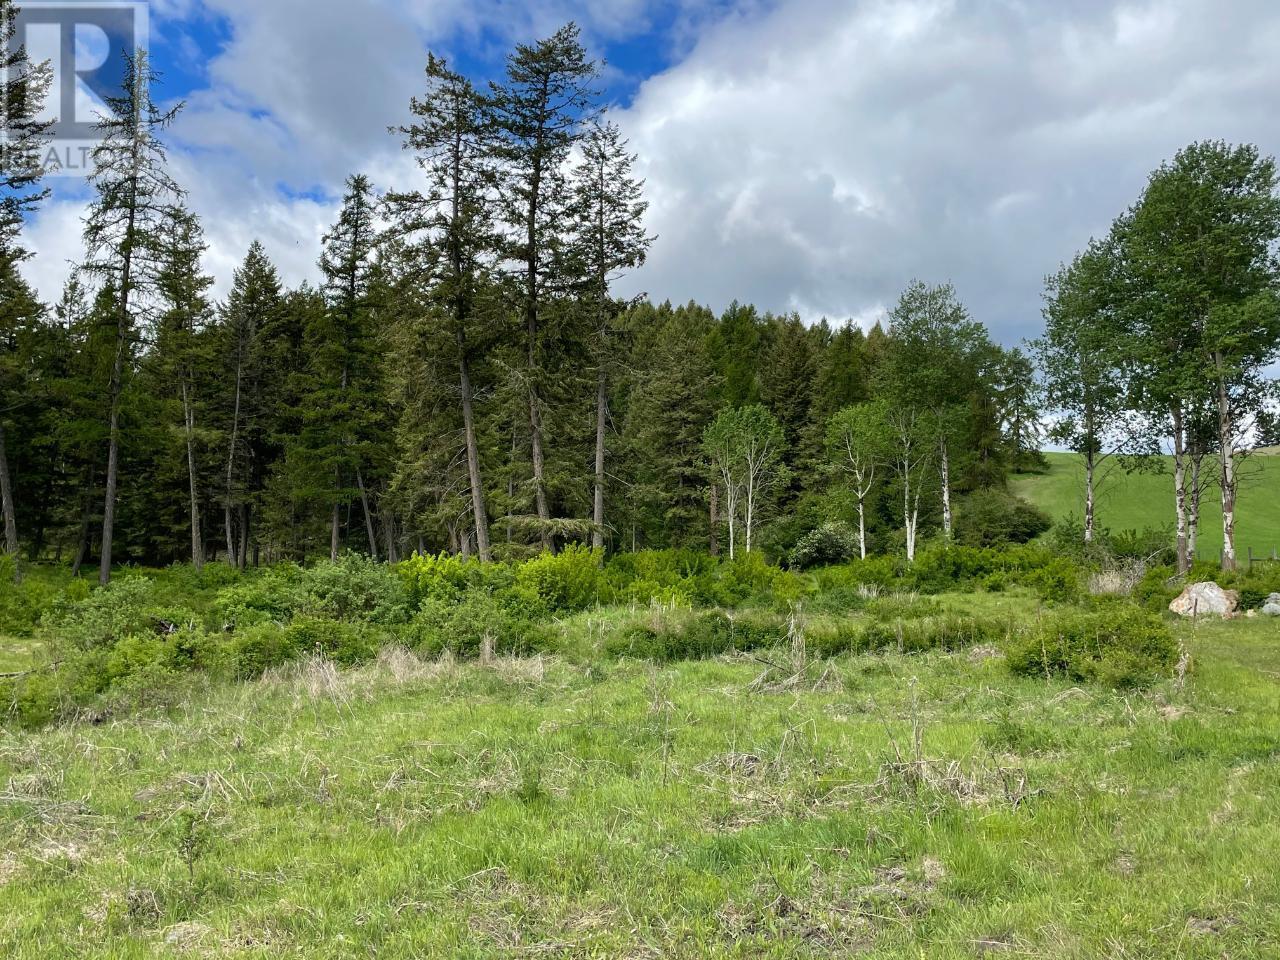 4685 Hwy 3,, Rock Creek/bridesville, British Columbia  V0H 1Y0 - Photo 55 - 189733